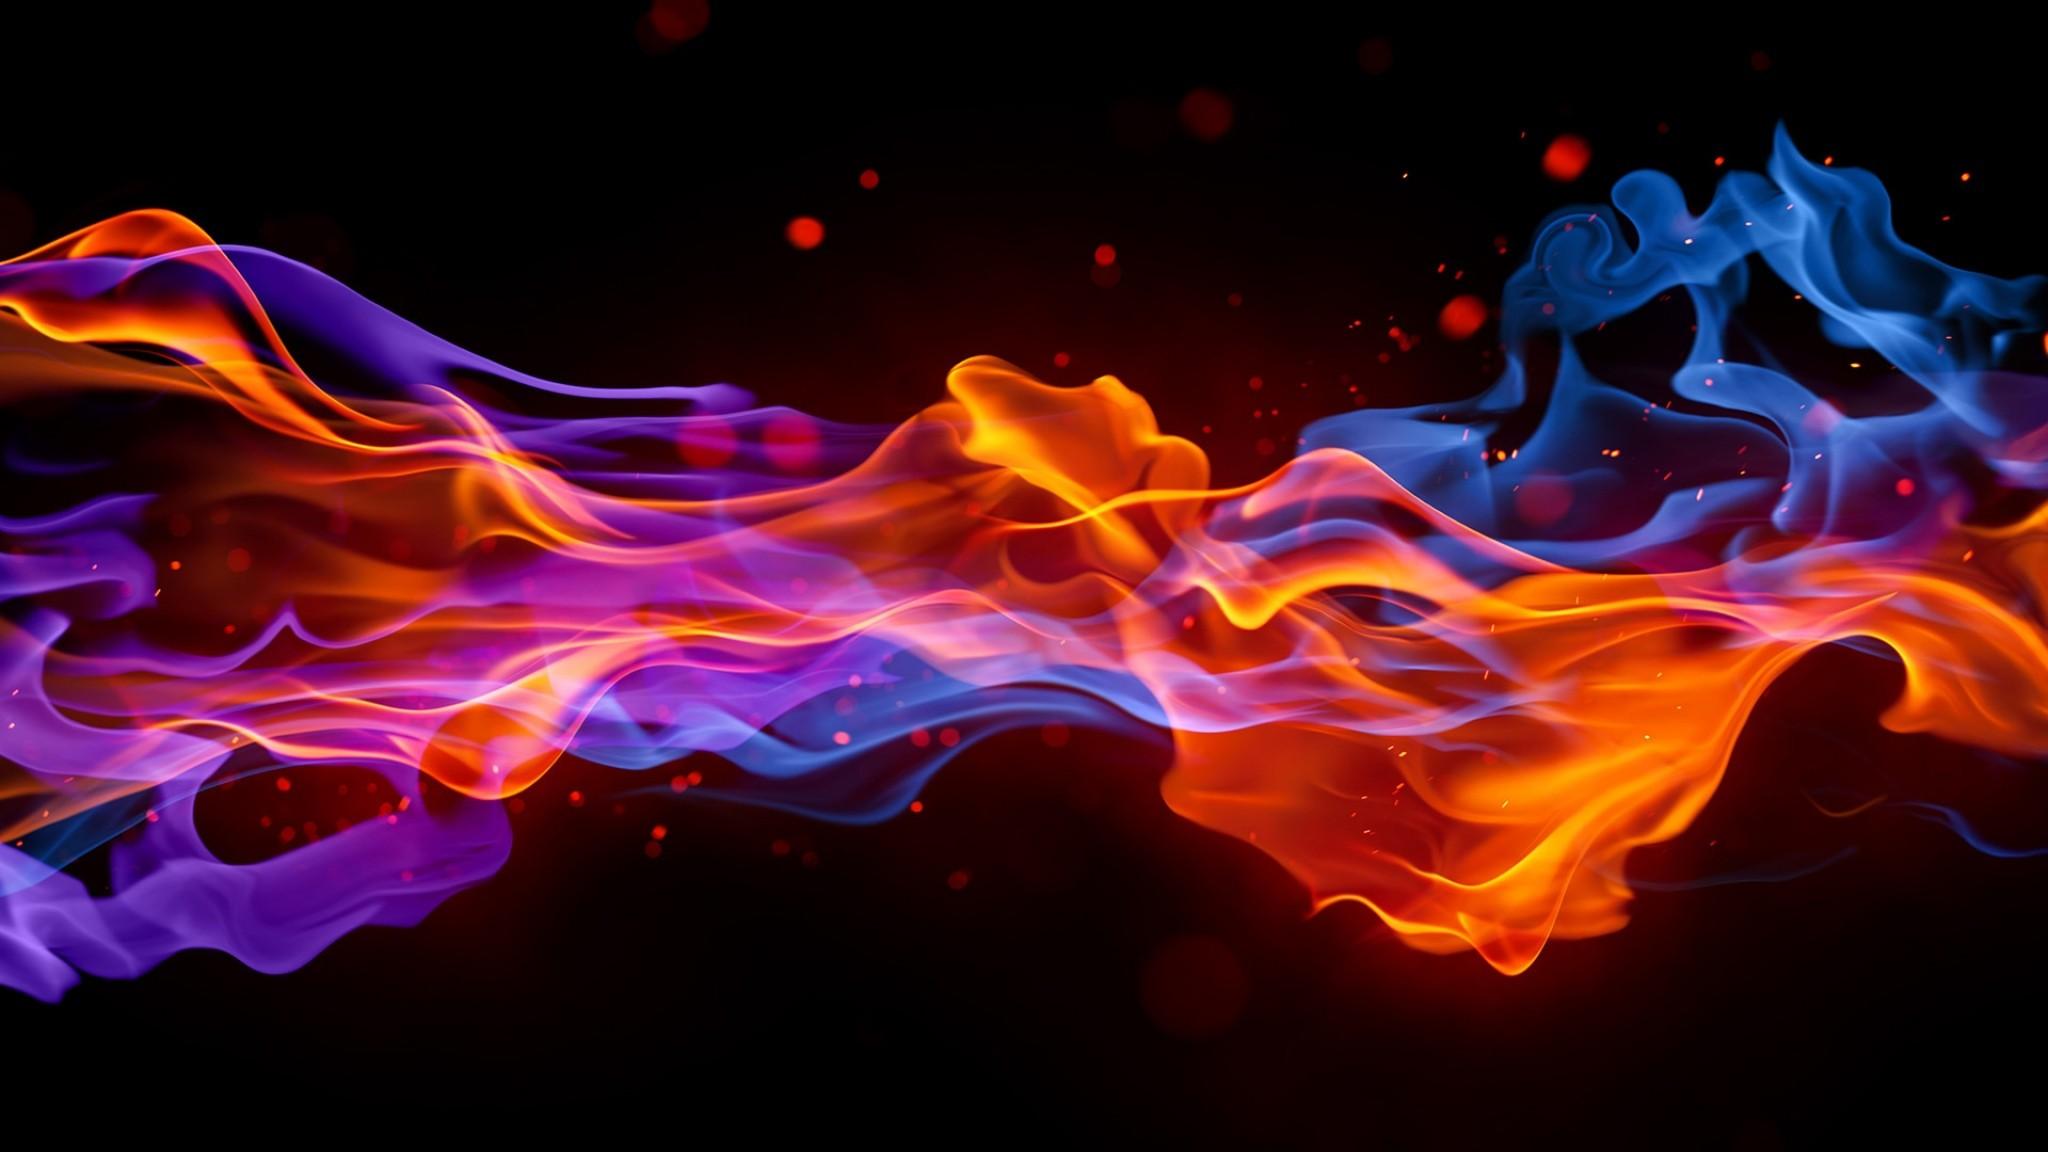 Wallpaper Smoke, Fire, Bright, Colorful, Background HD HD .